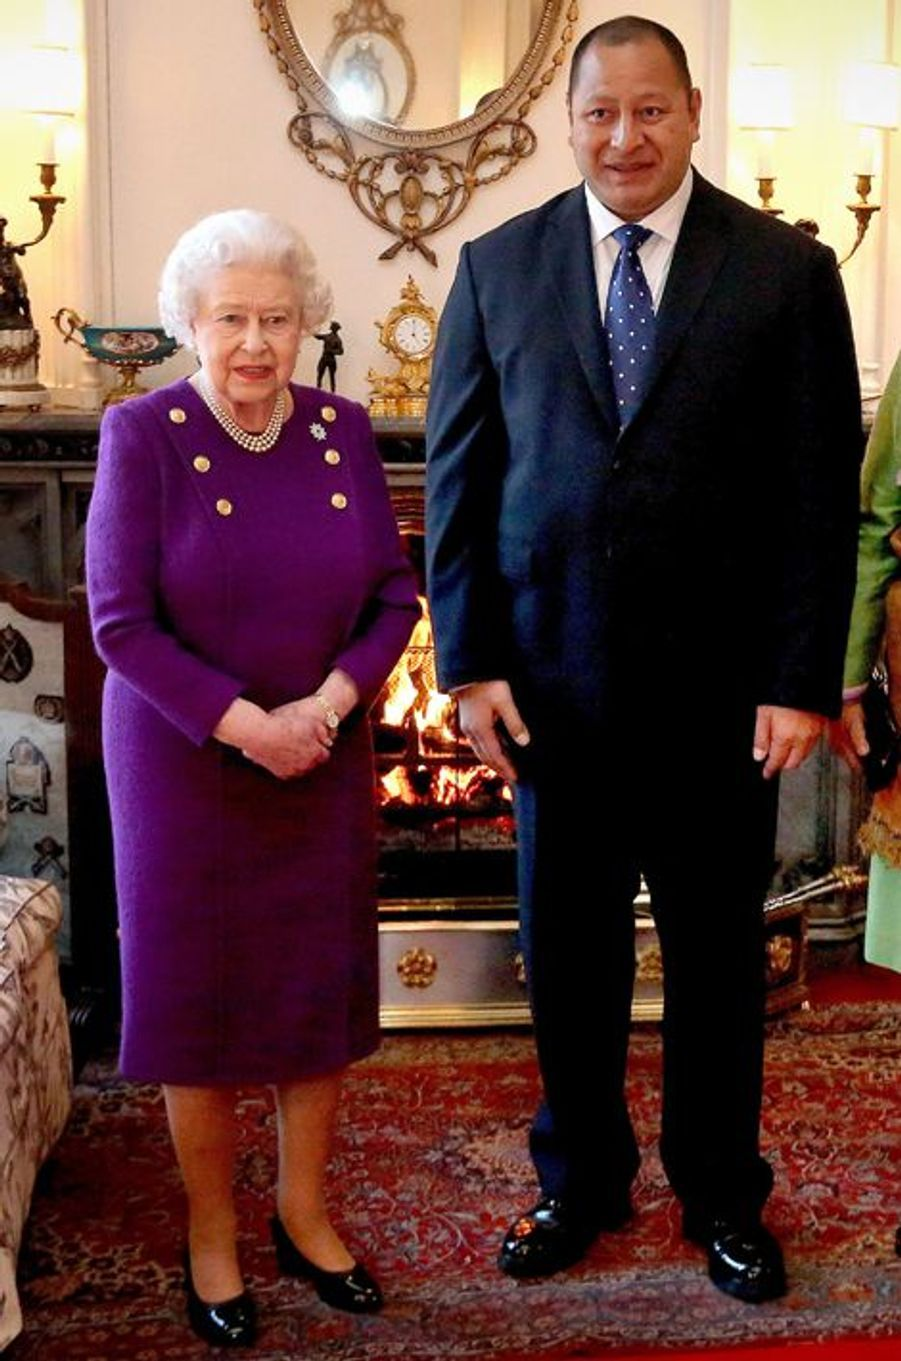 La reine Elizabeth II, le 2 fevrier 2015